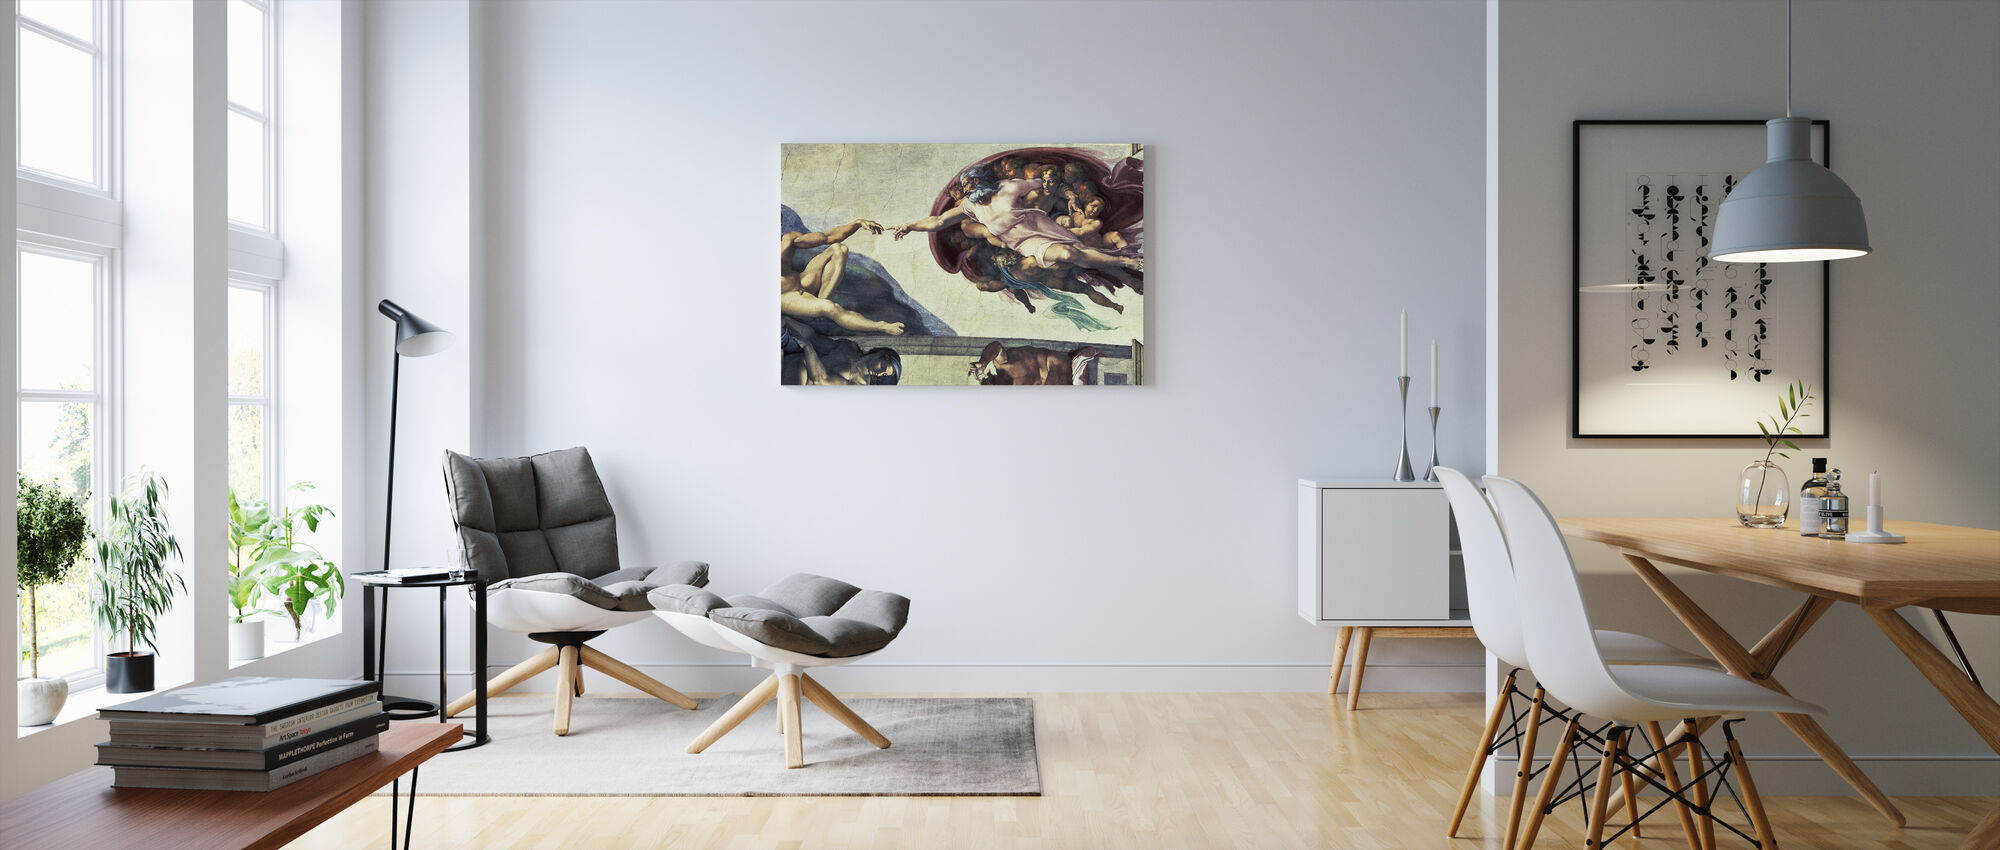 Luominen Adam - Michelangelo Buonarroti - Canvastaulu - Olohuone